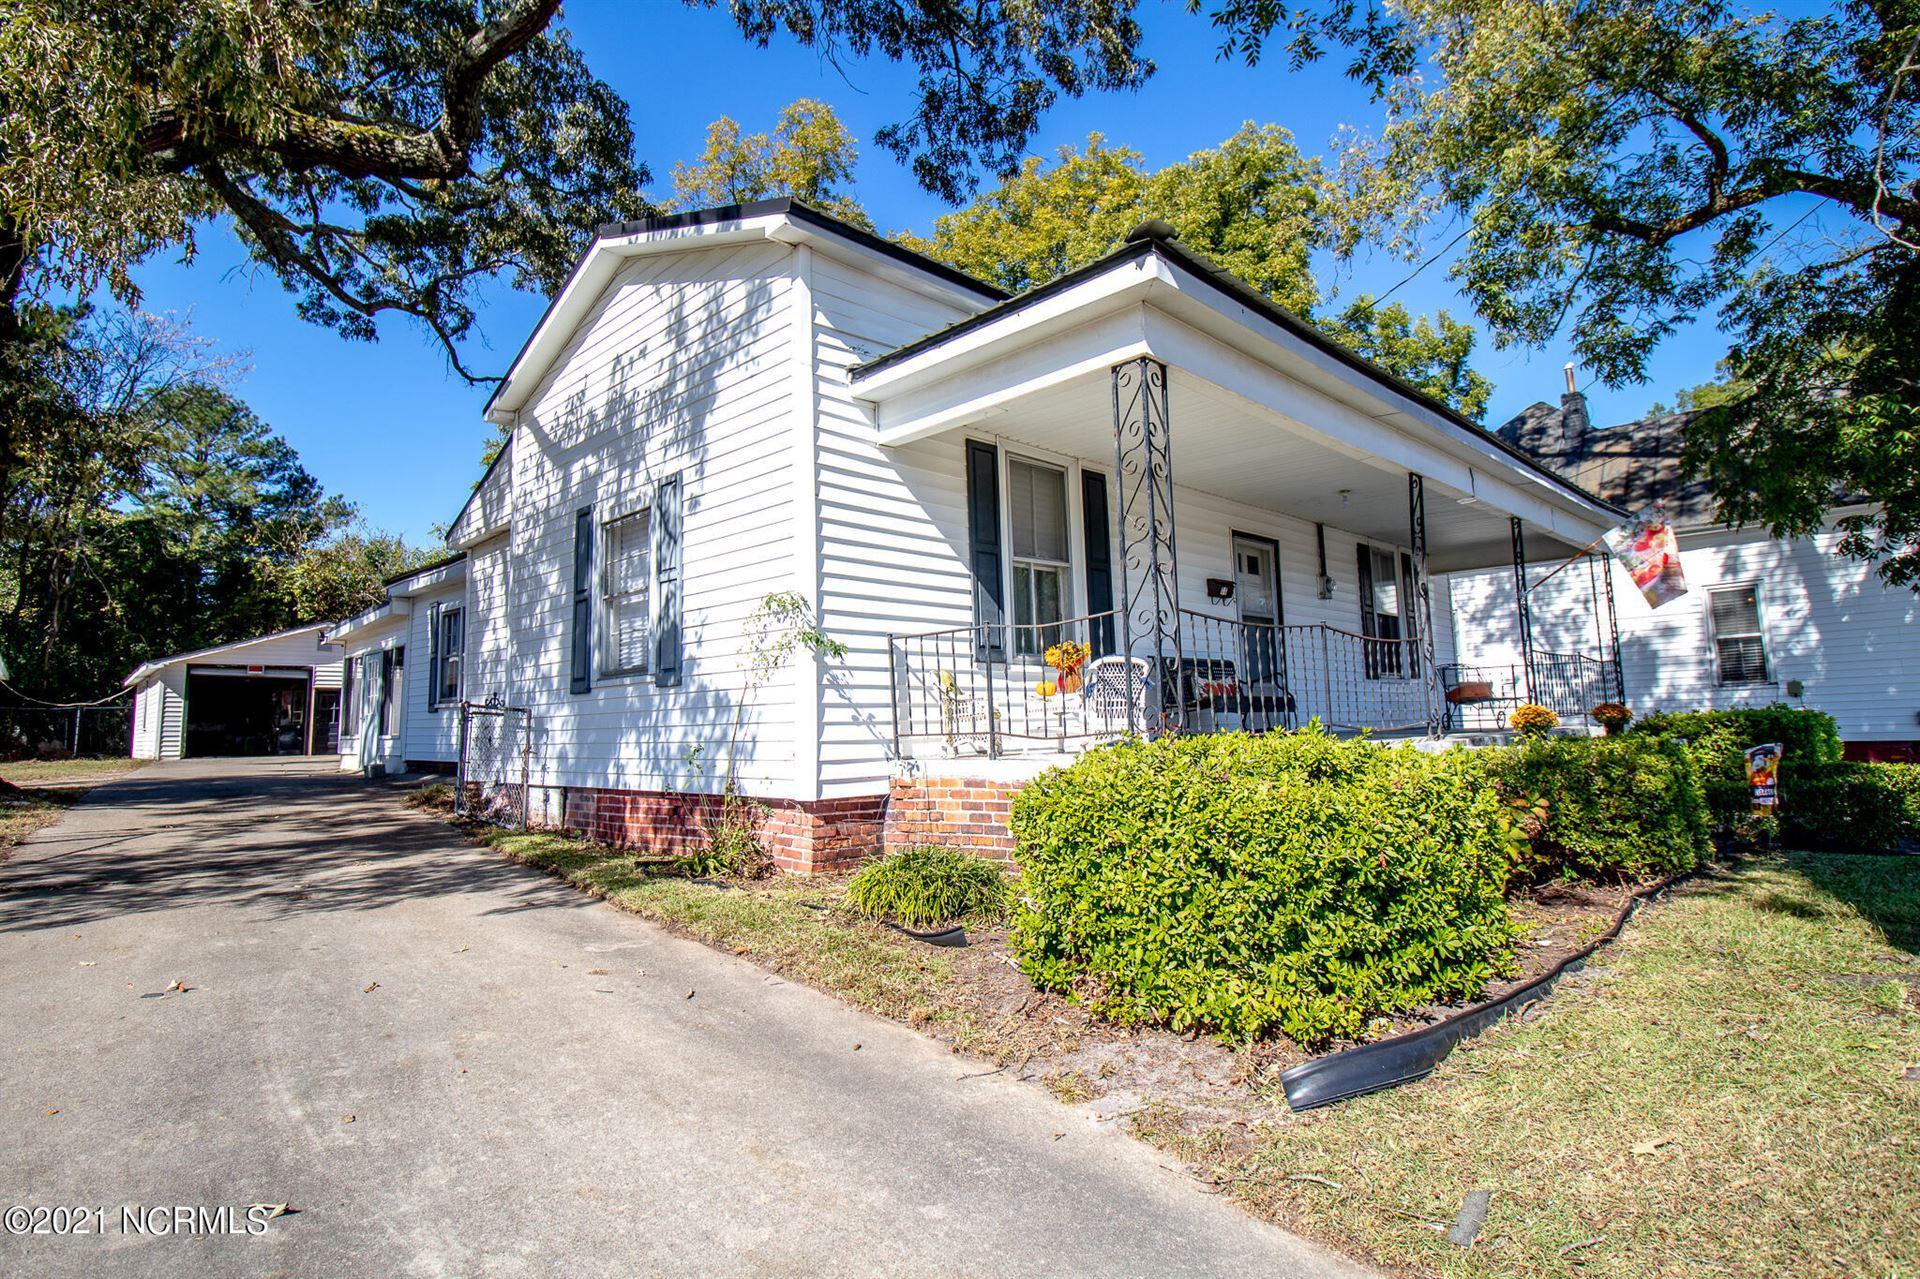 Photo of 1006 Branch Street, Rocky Mount, NC 27801 (MLS # 100296046)